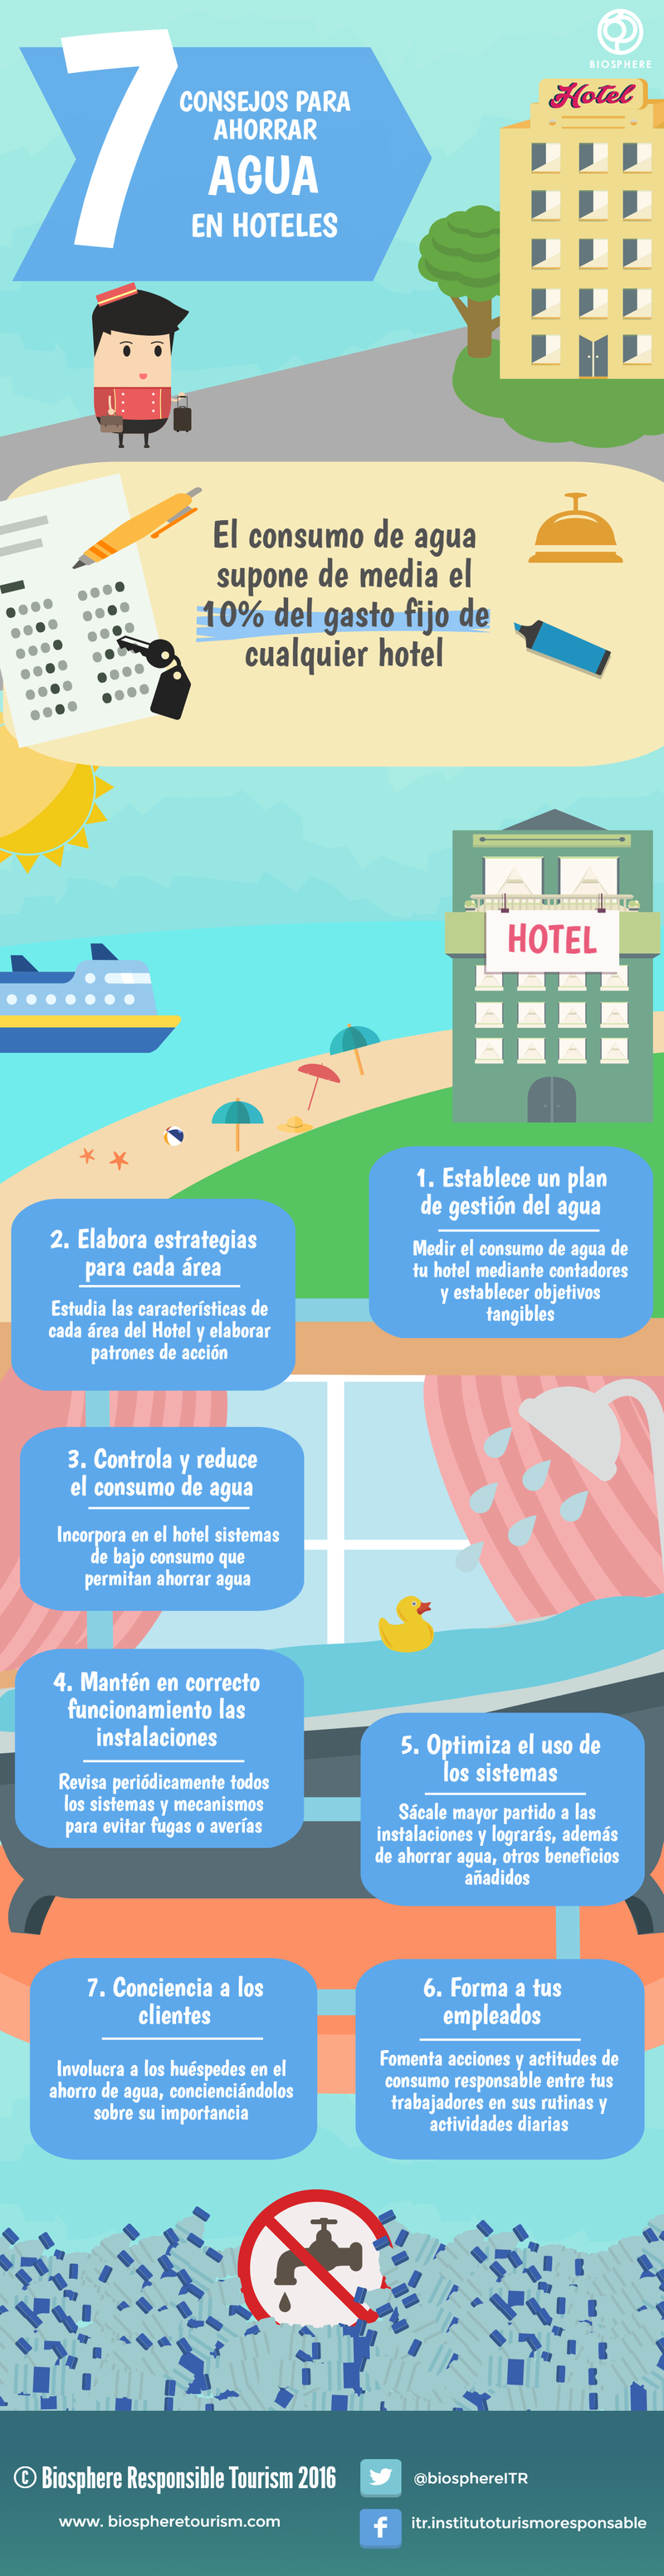 7 consejos para ahorrar agua en hoteles biosphere for Ahorro de agua